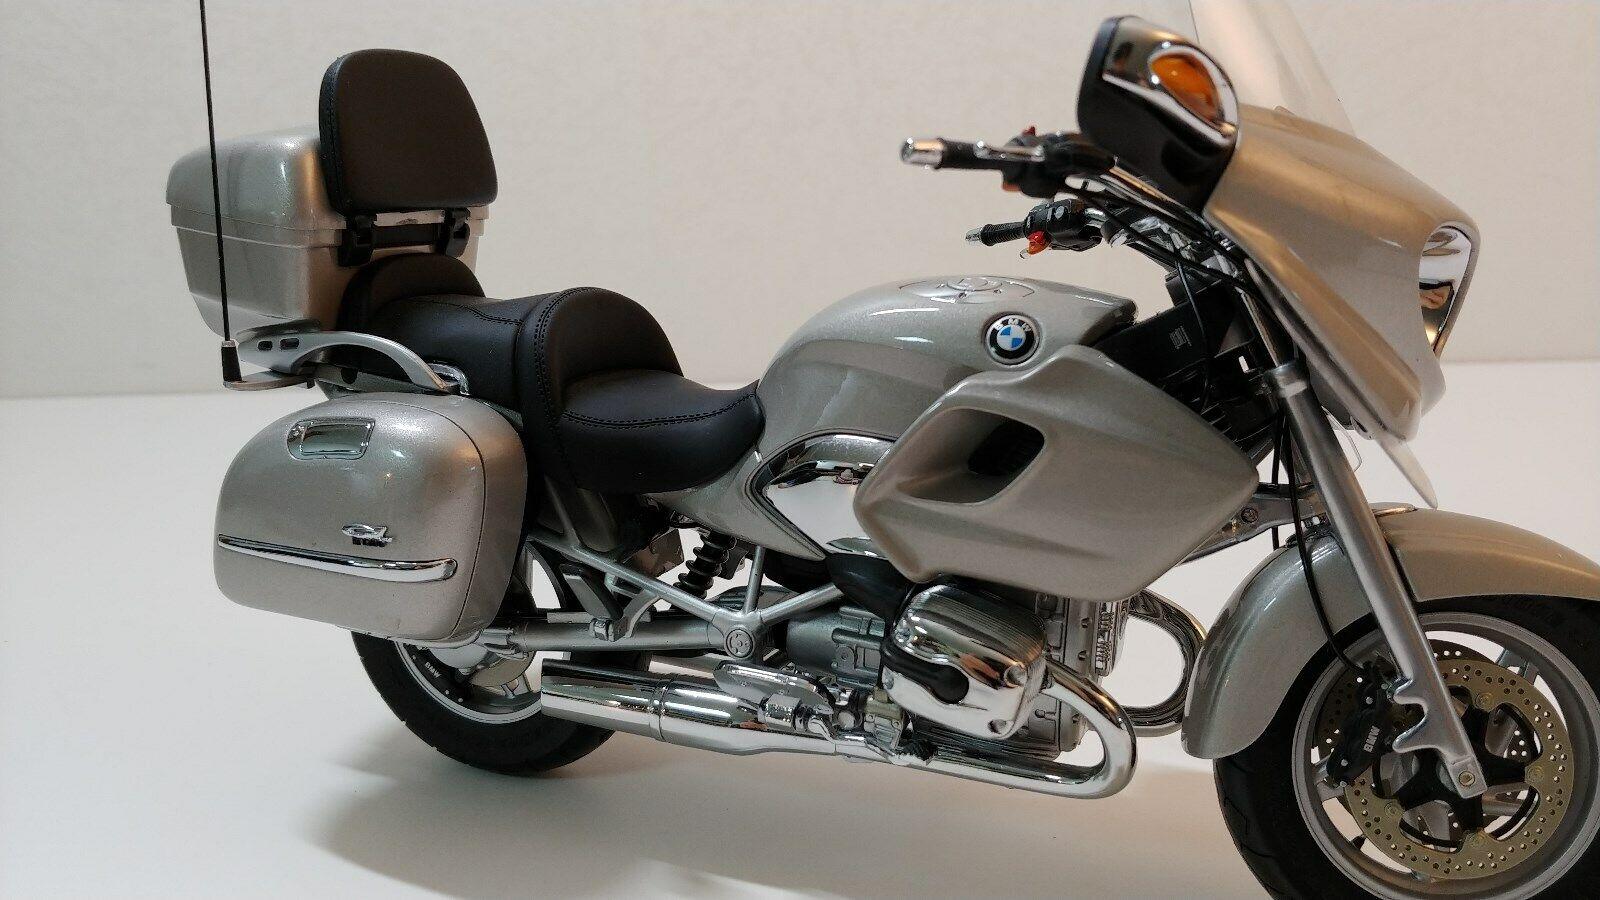 110 concessionario BMW, BMW R 1200 CL Comfortline Diecast BICI